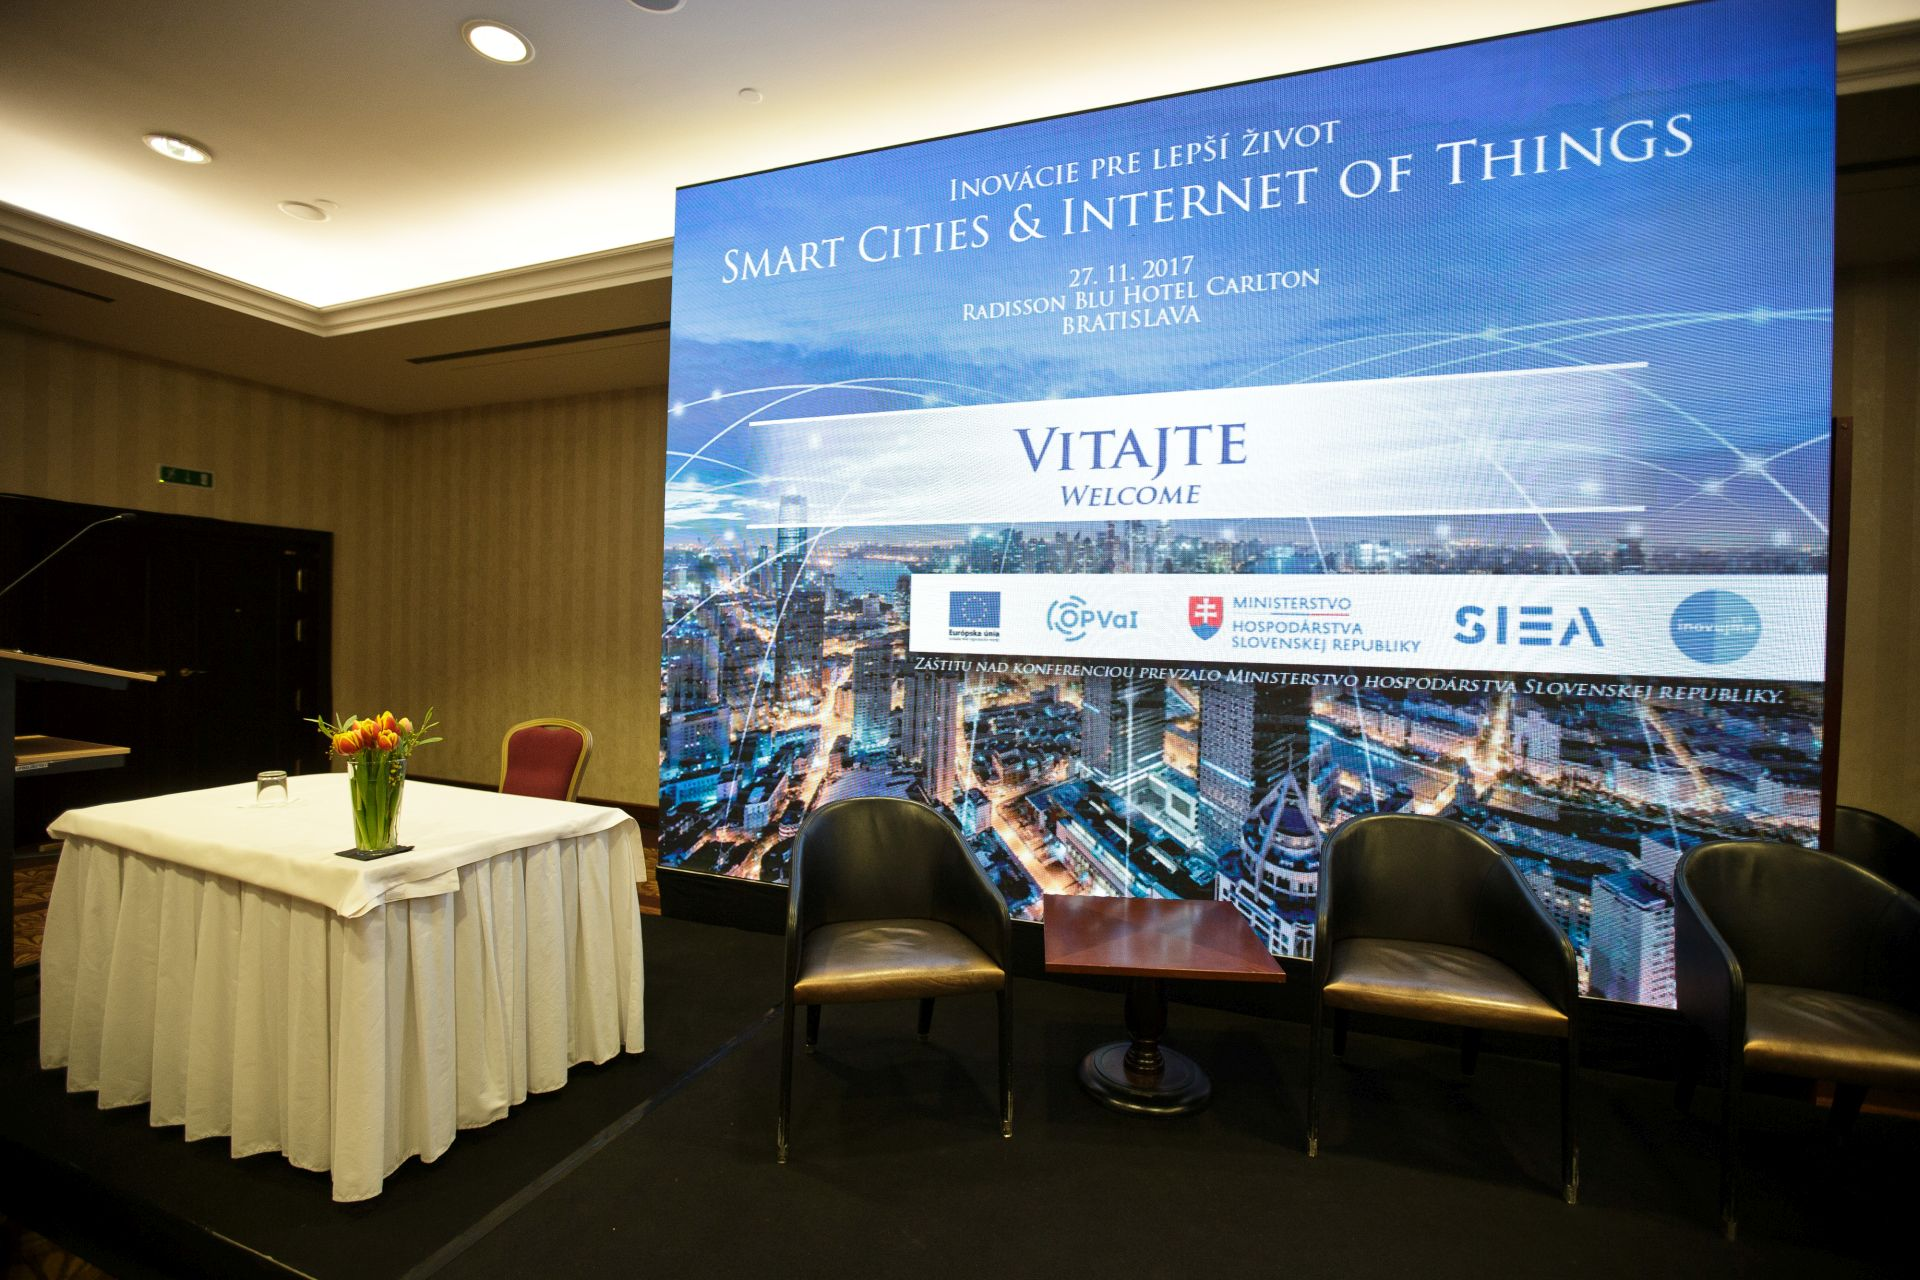 Konferencia Smart Cities, Bratislava, 27. 11. 2017